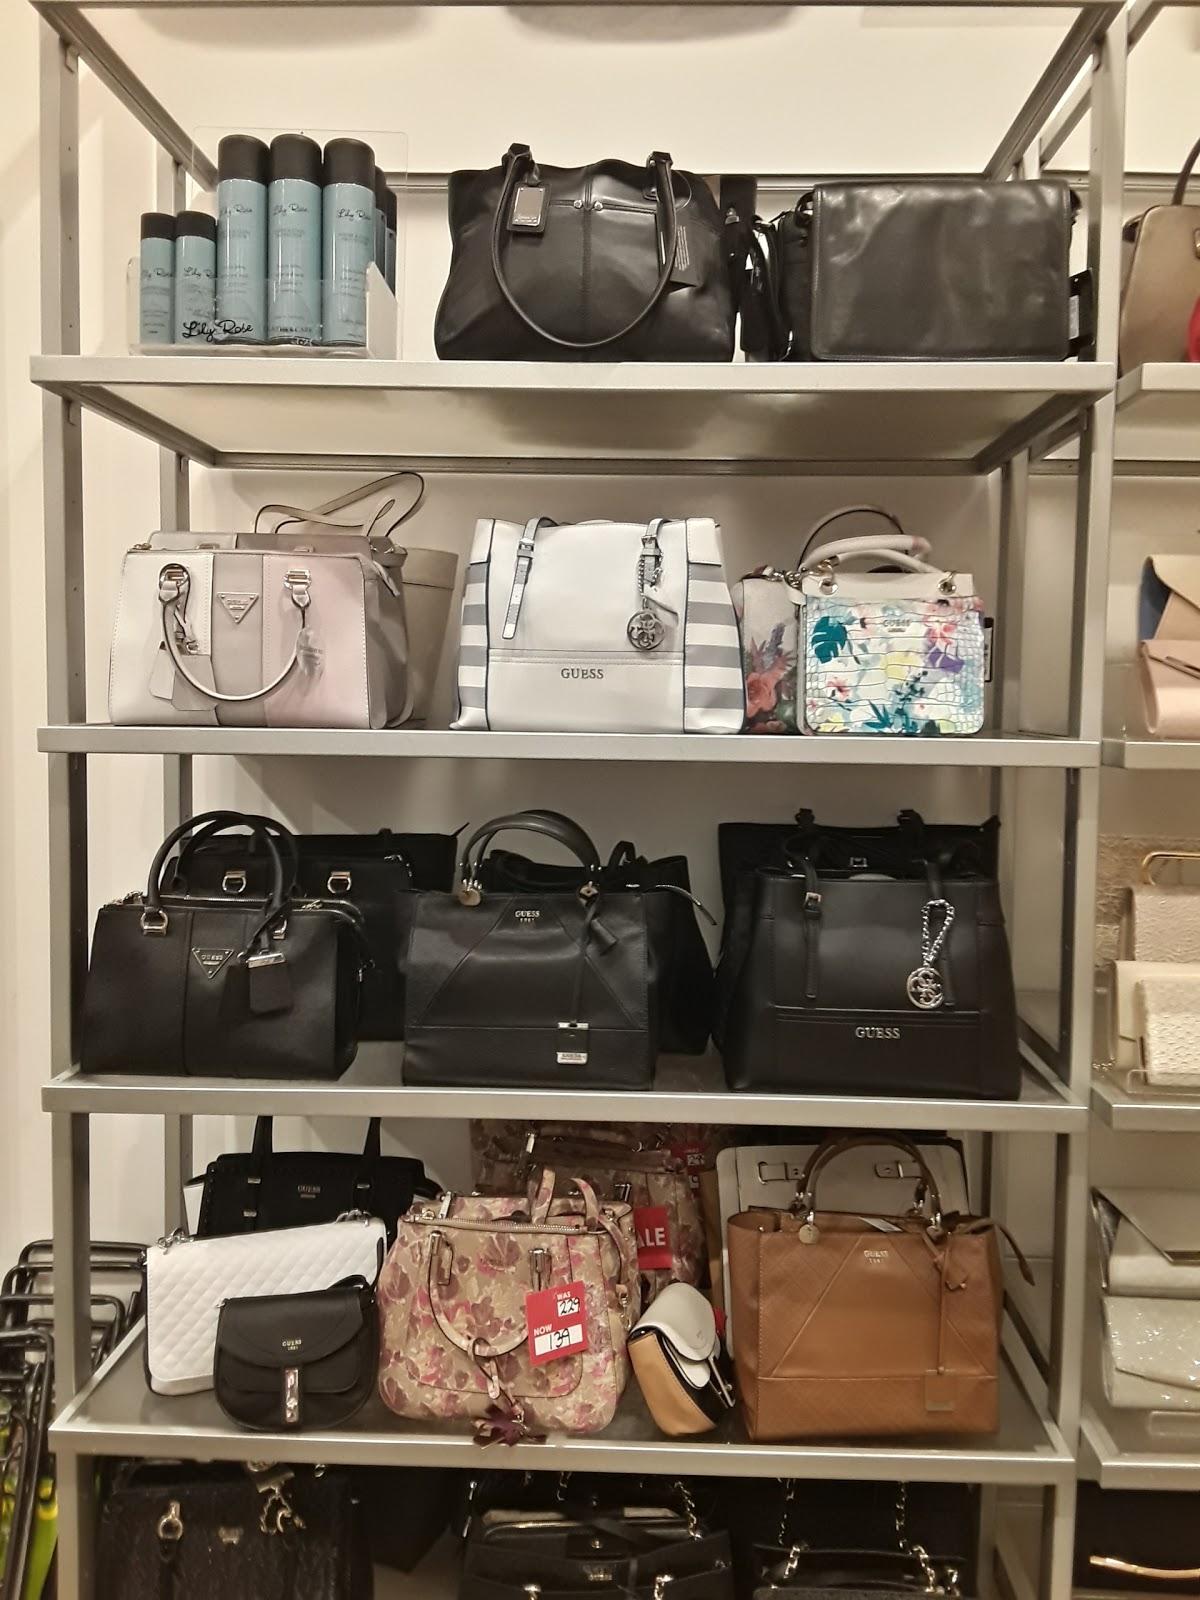 264ce68167f01d Guess Handbags Strandbags | Handbag Reviews 2018